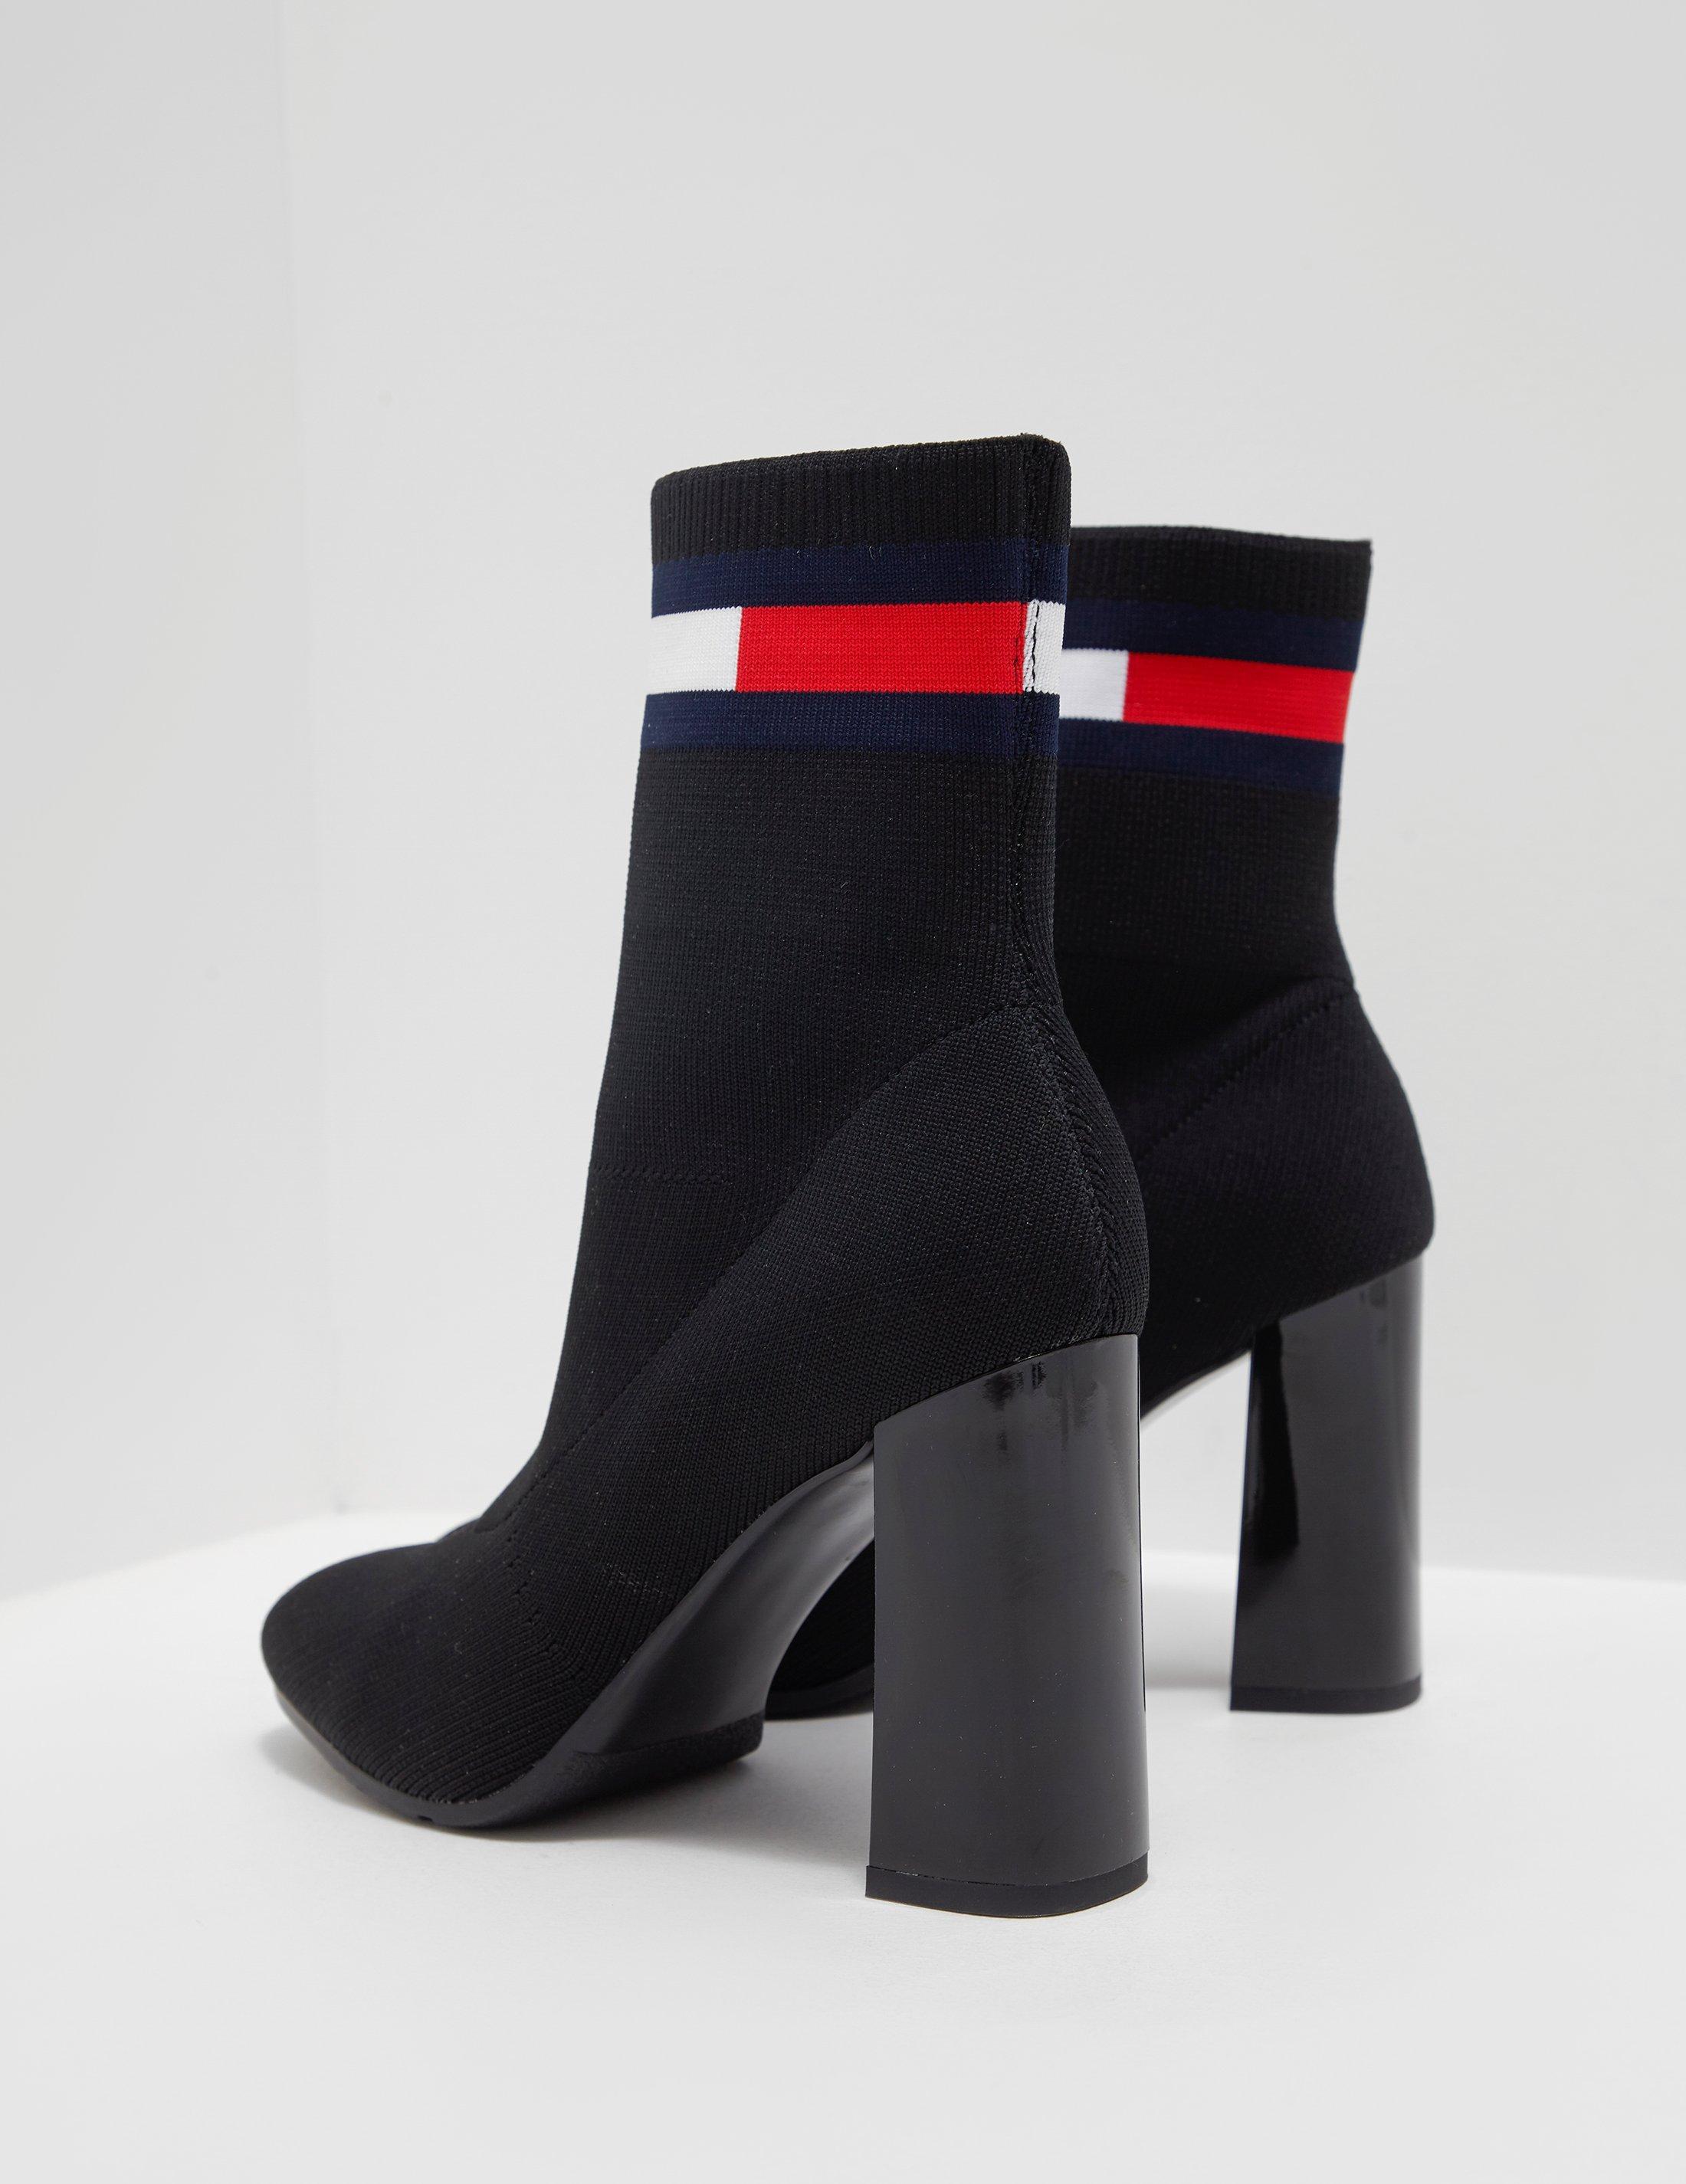 d9d029b2d Tommy Hilfiger Womens Sock Heeled Boots Black in Black - Lyst